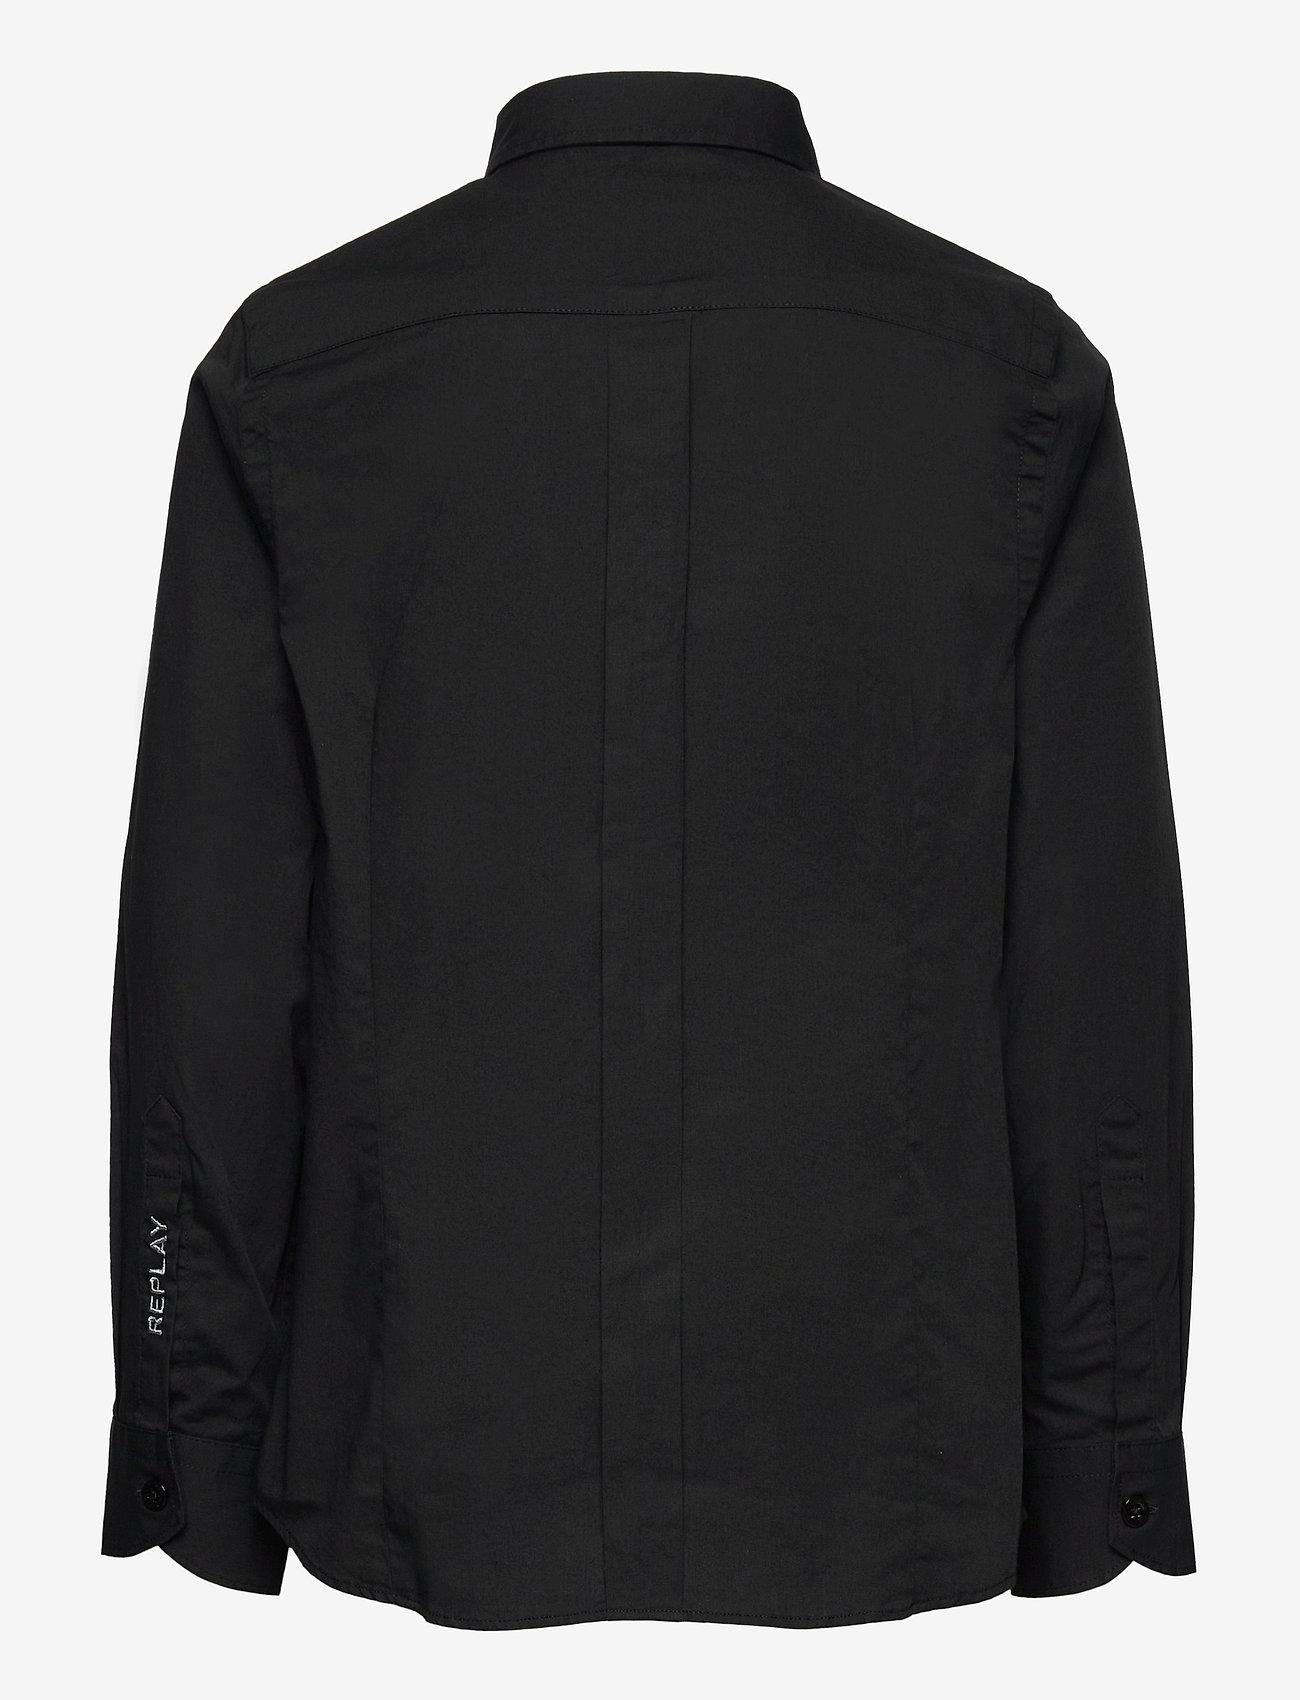 Replay - SHIRT Back To School - overhemden - black - 1